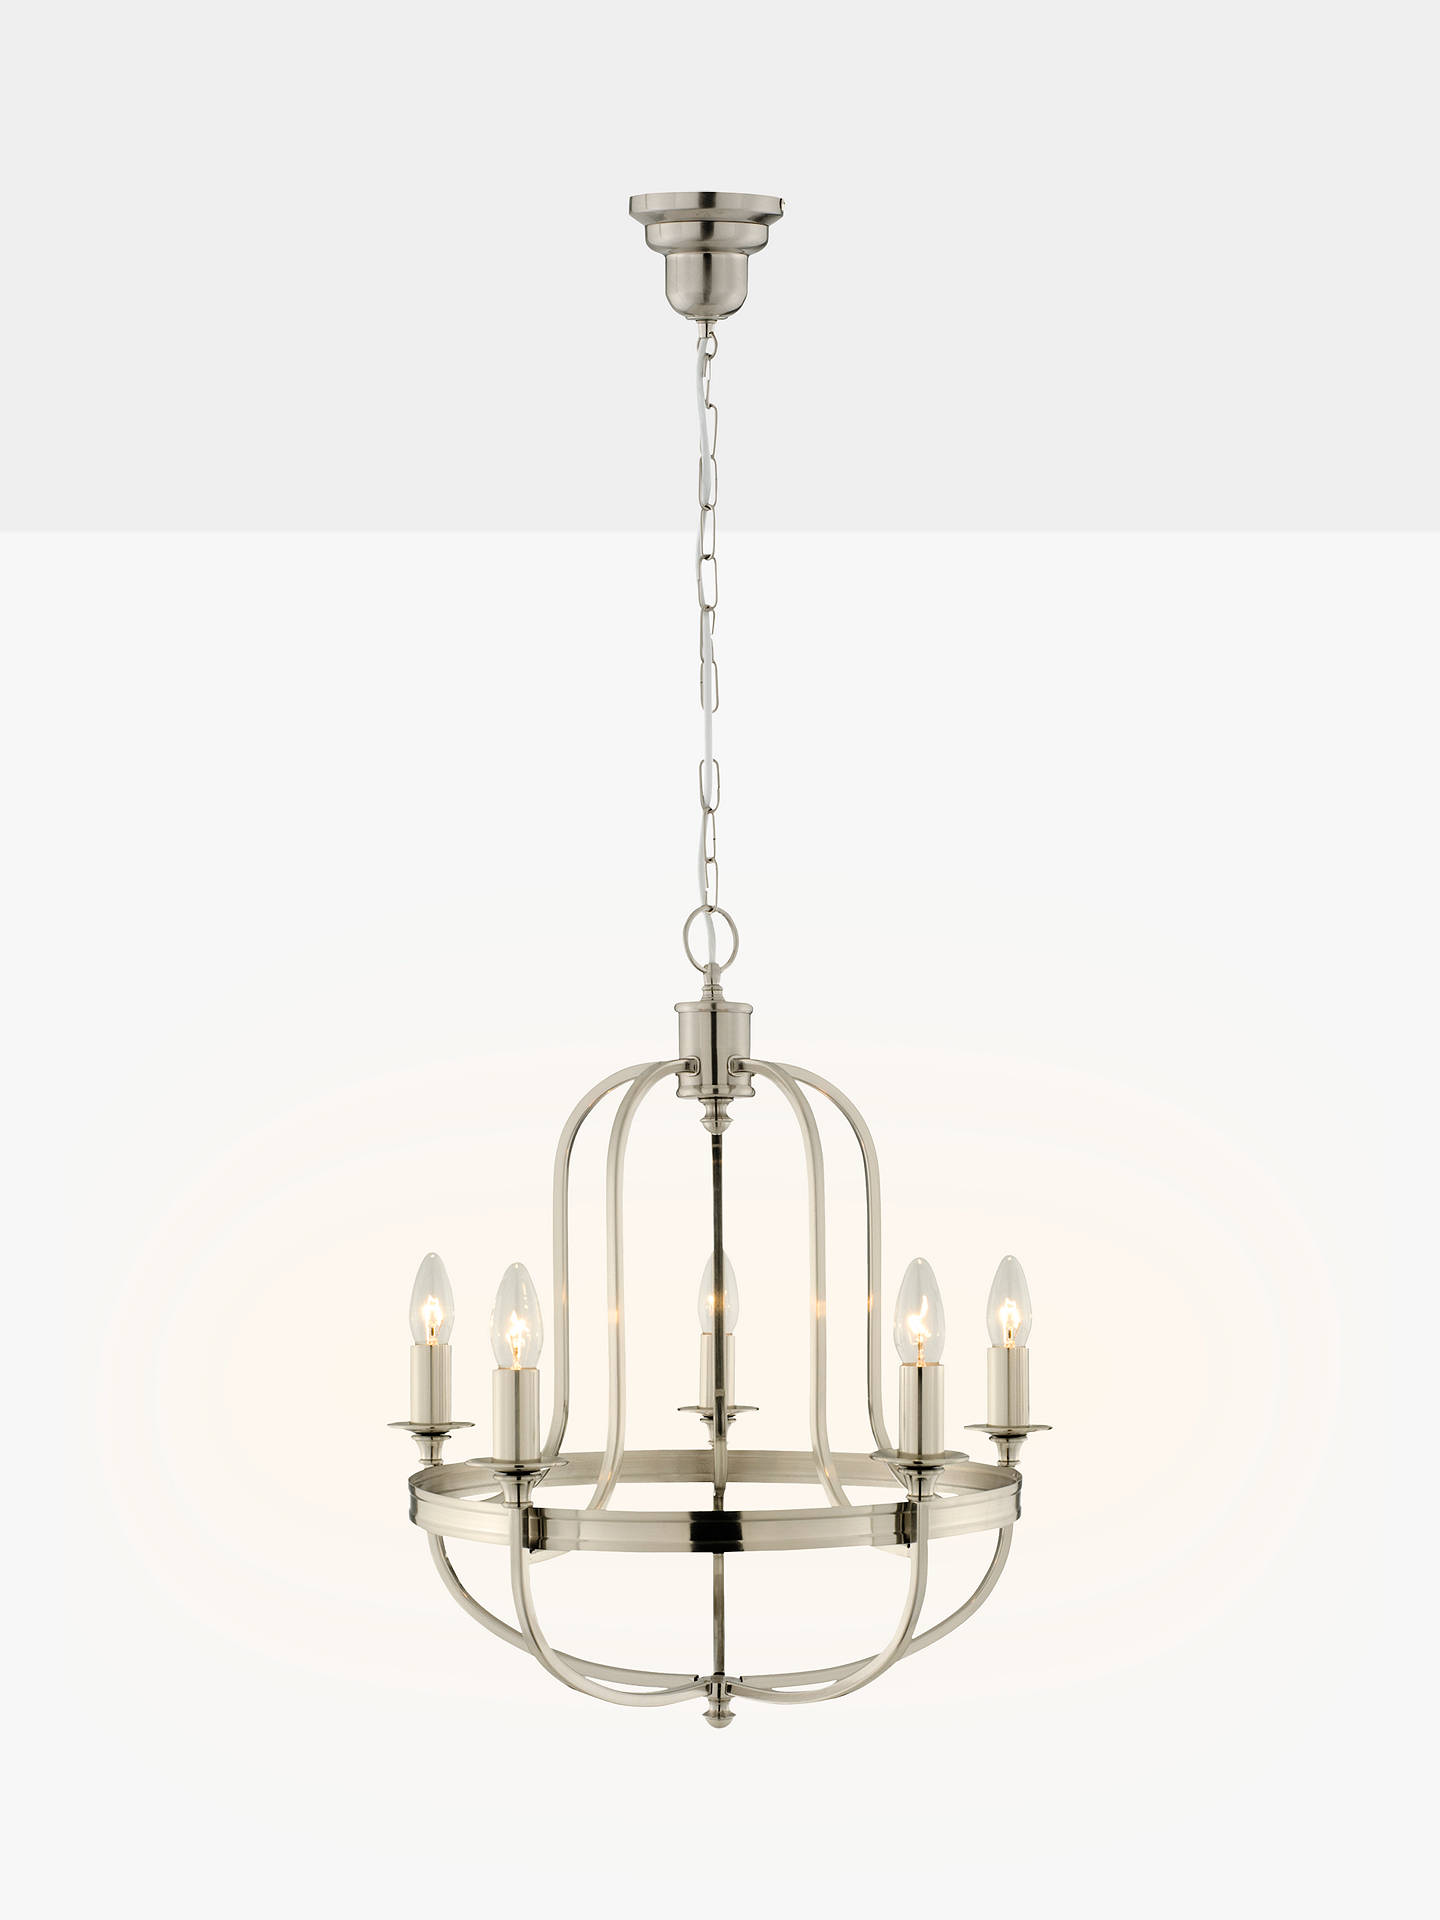 Buy john lewis partners warwick chandelier ceiling light brushed chrome online at johnlewis